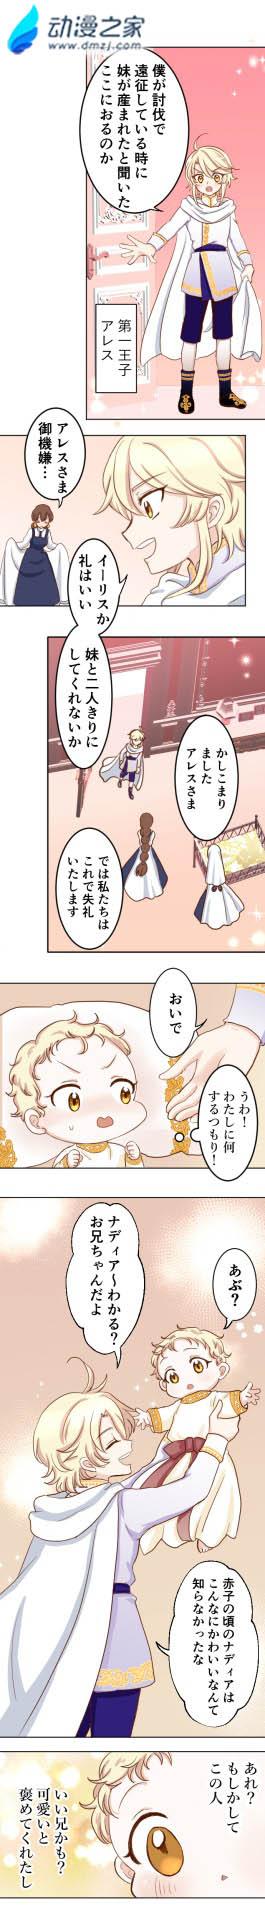 tenseka_0001_004.jpg